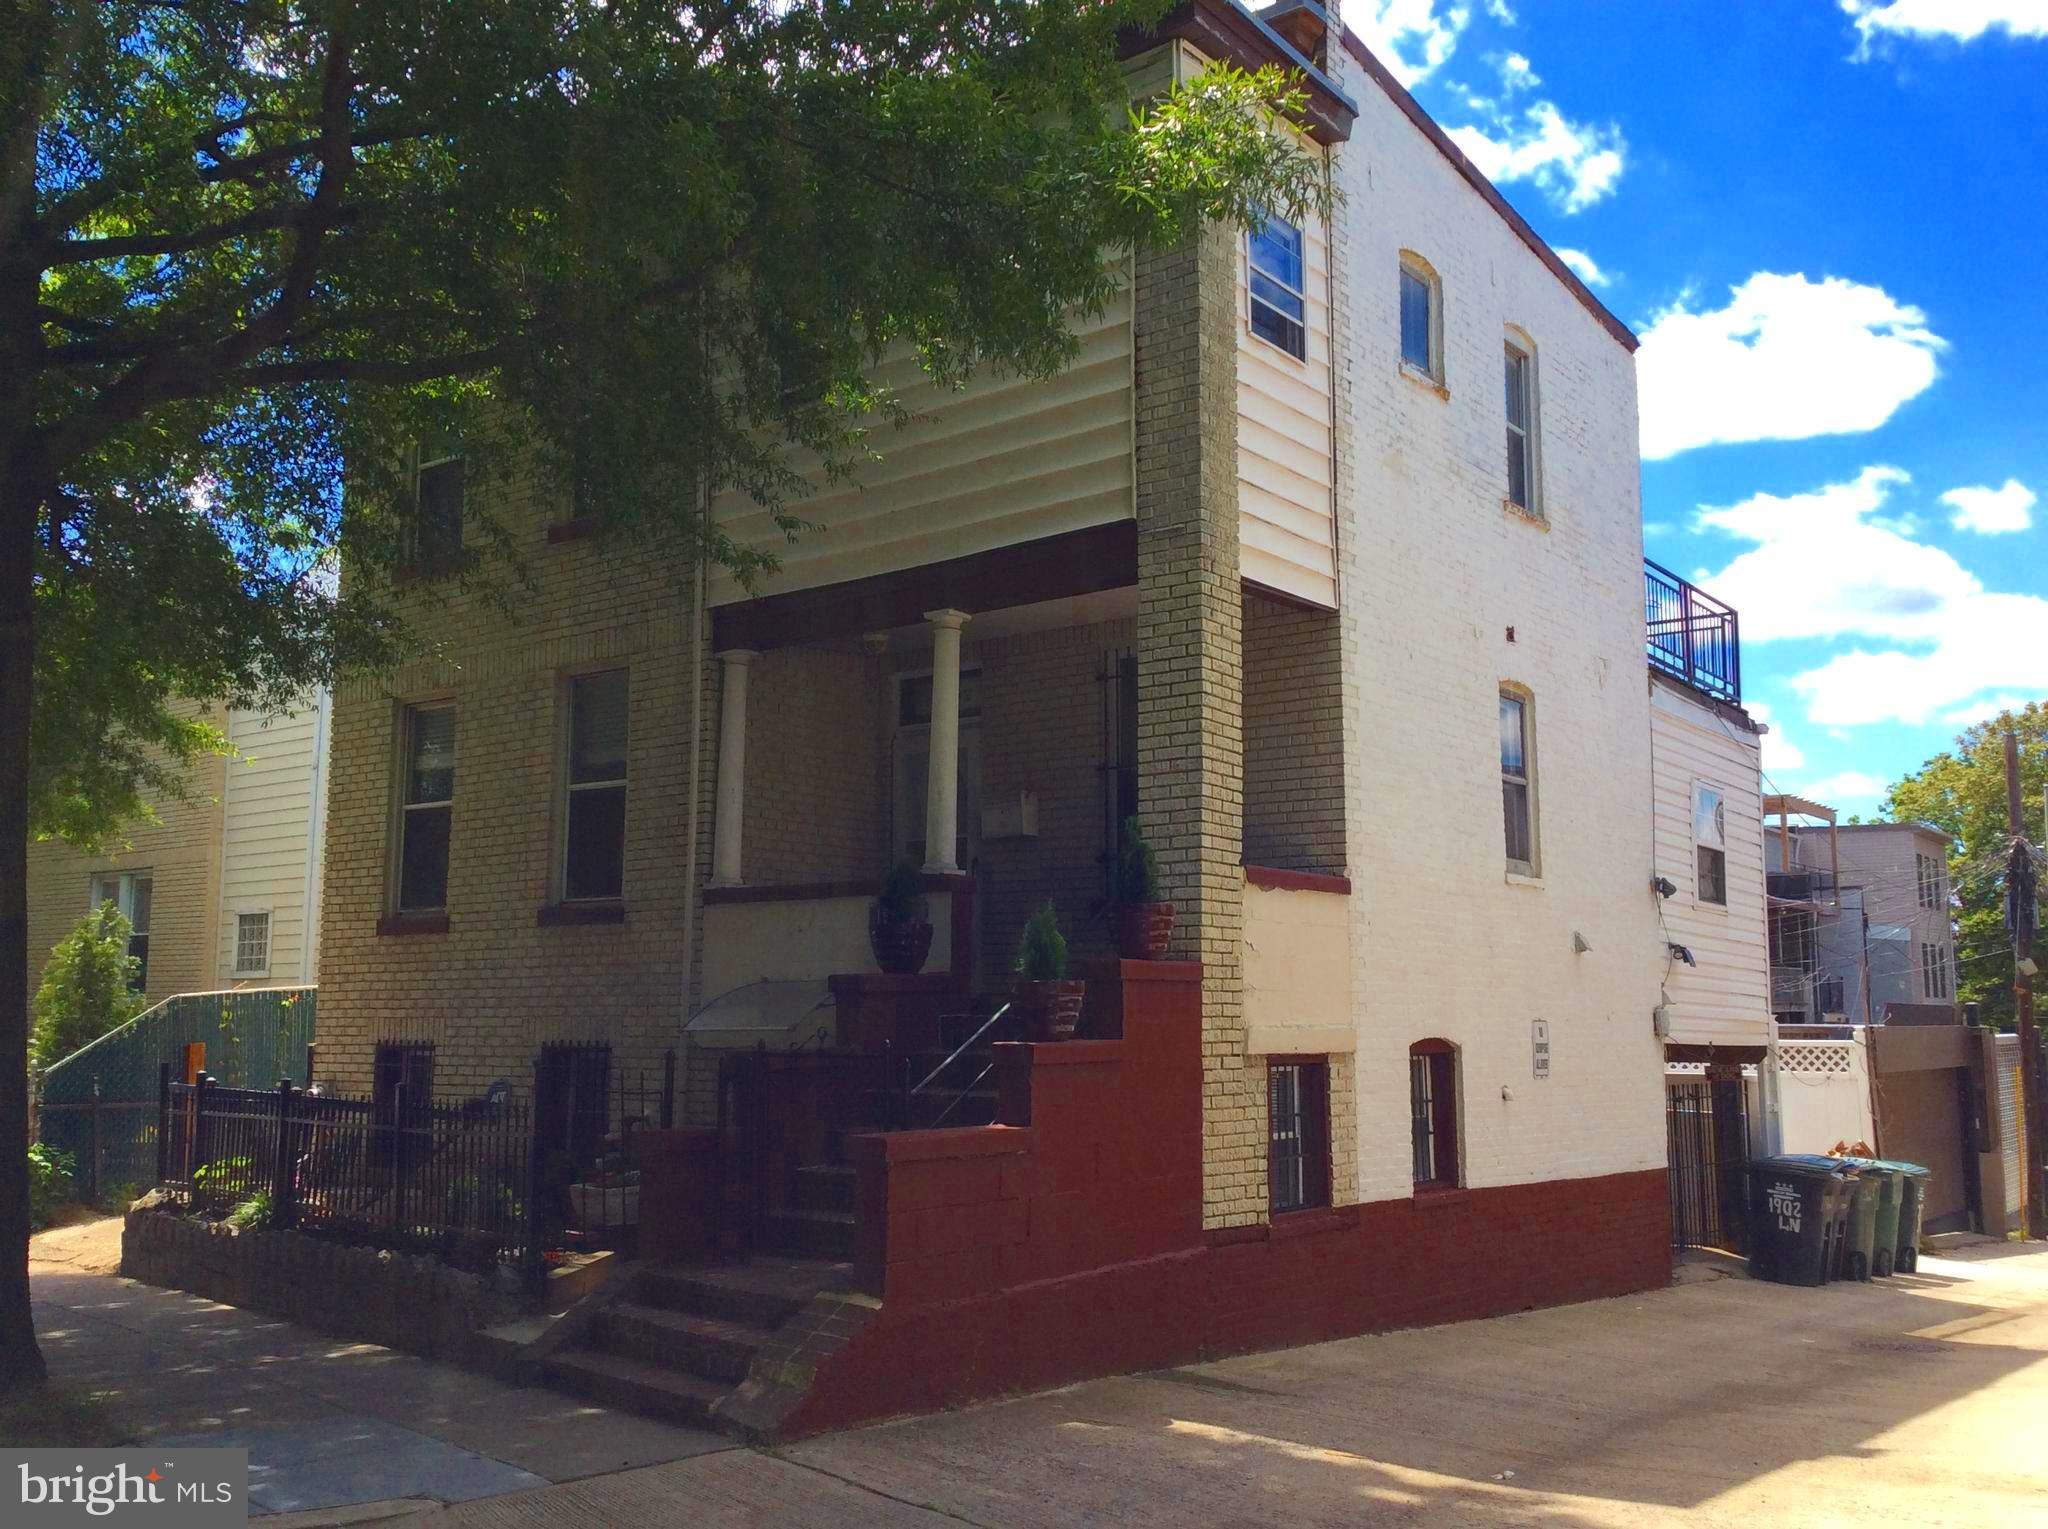 1902 Lincoln Road NE, Washington, DC 20002